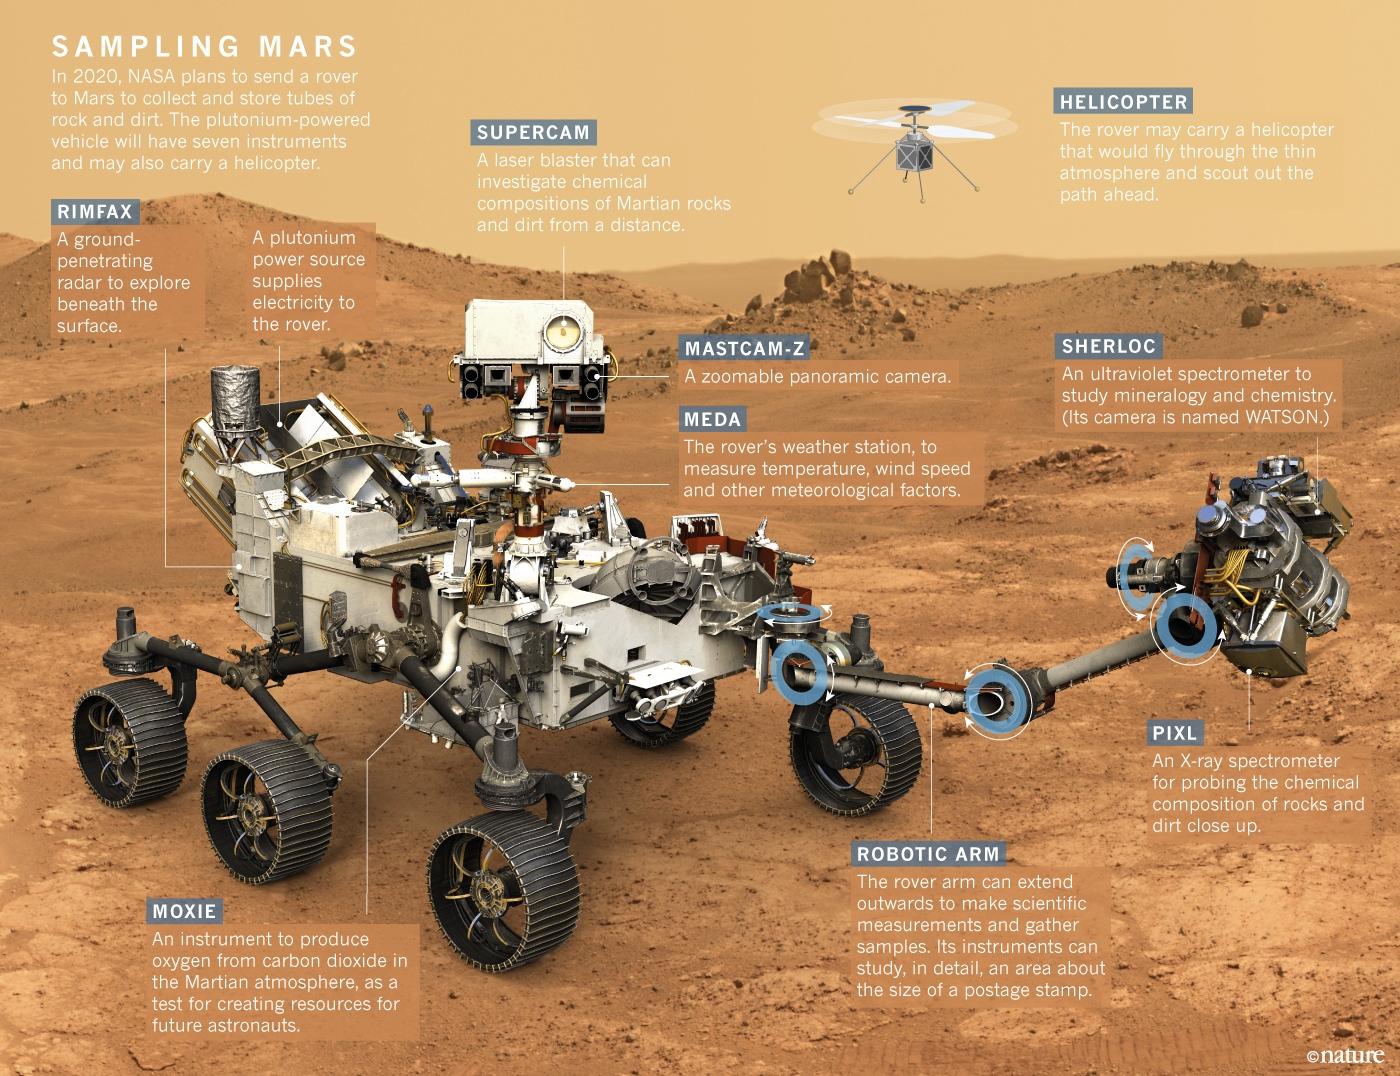 Mars-2020-annotated-lg.jpg